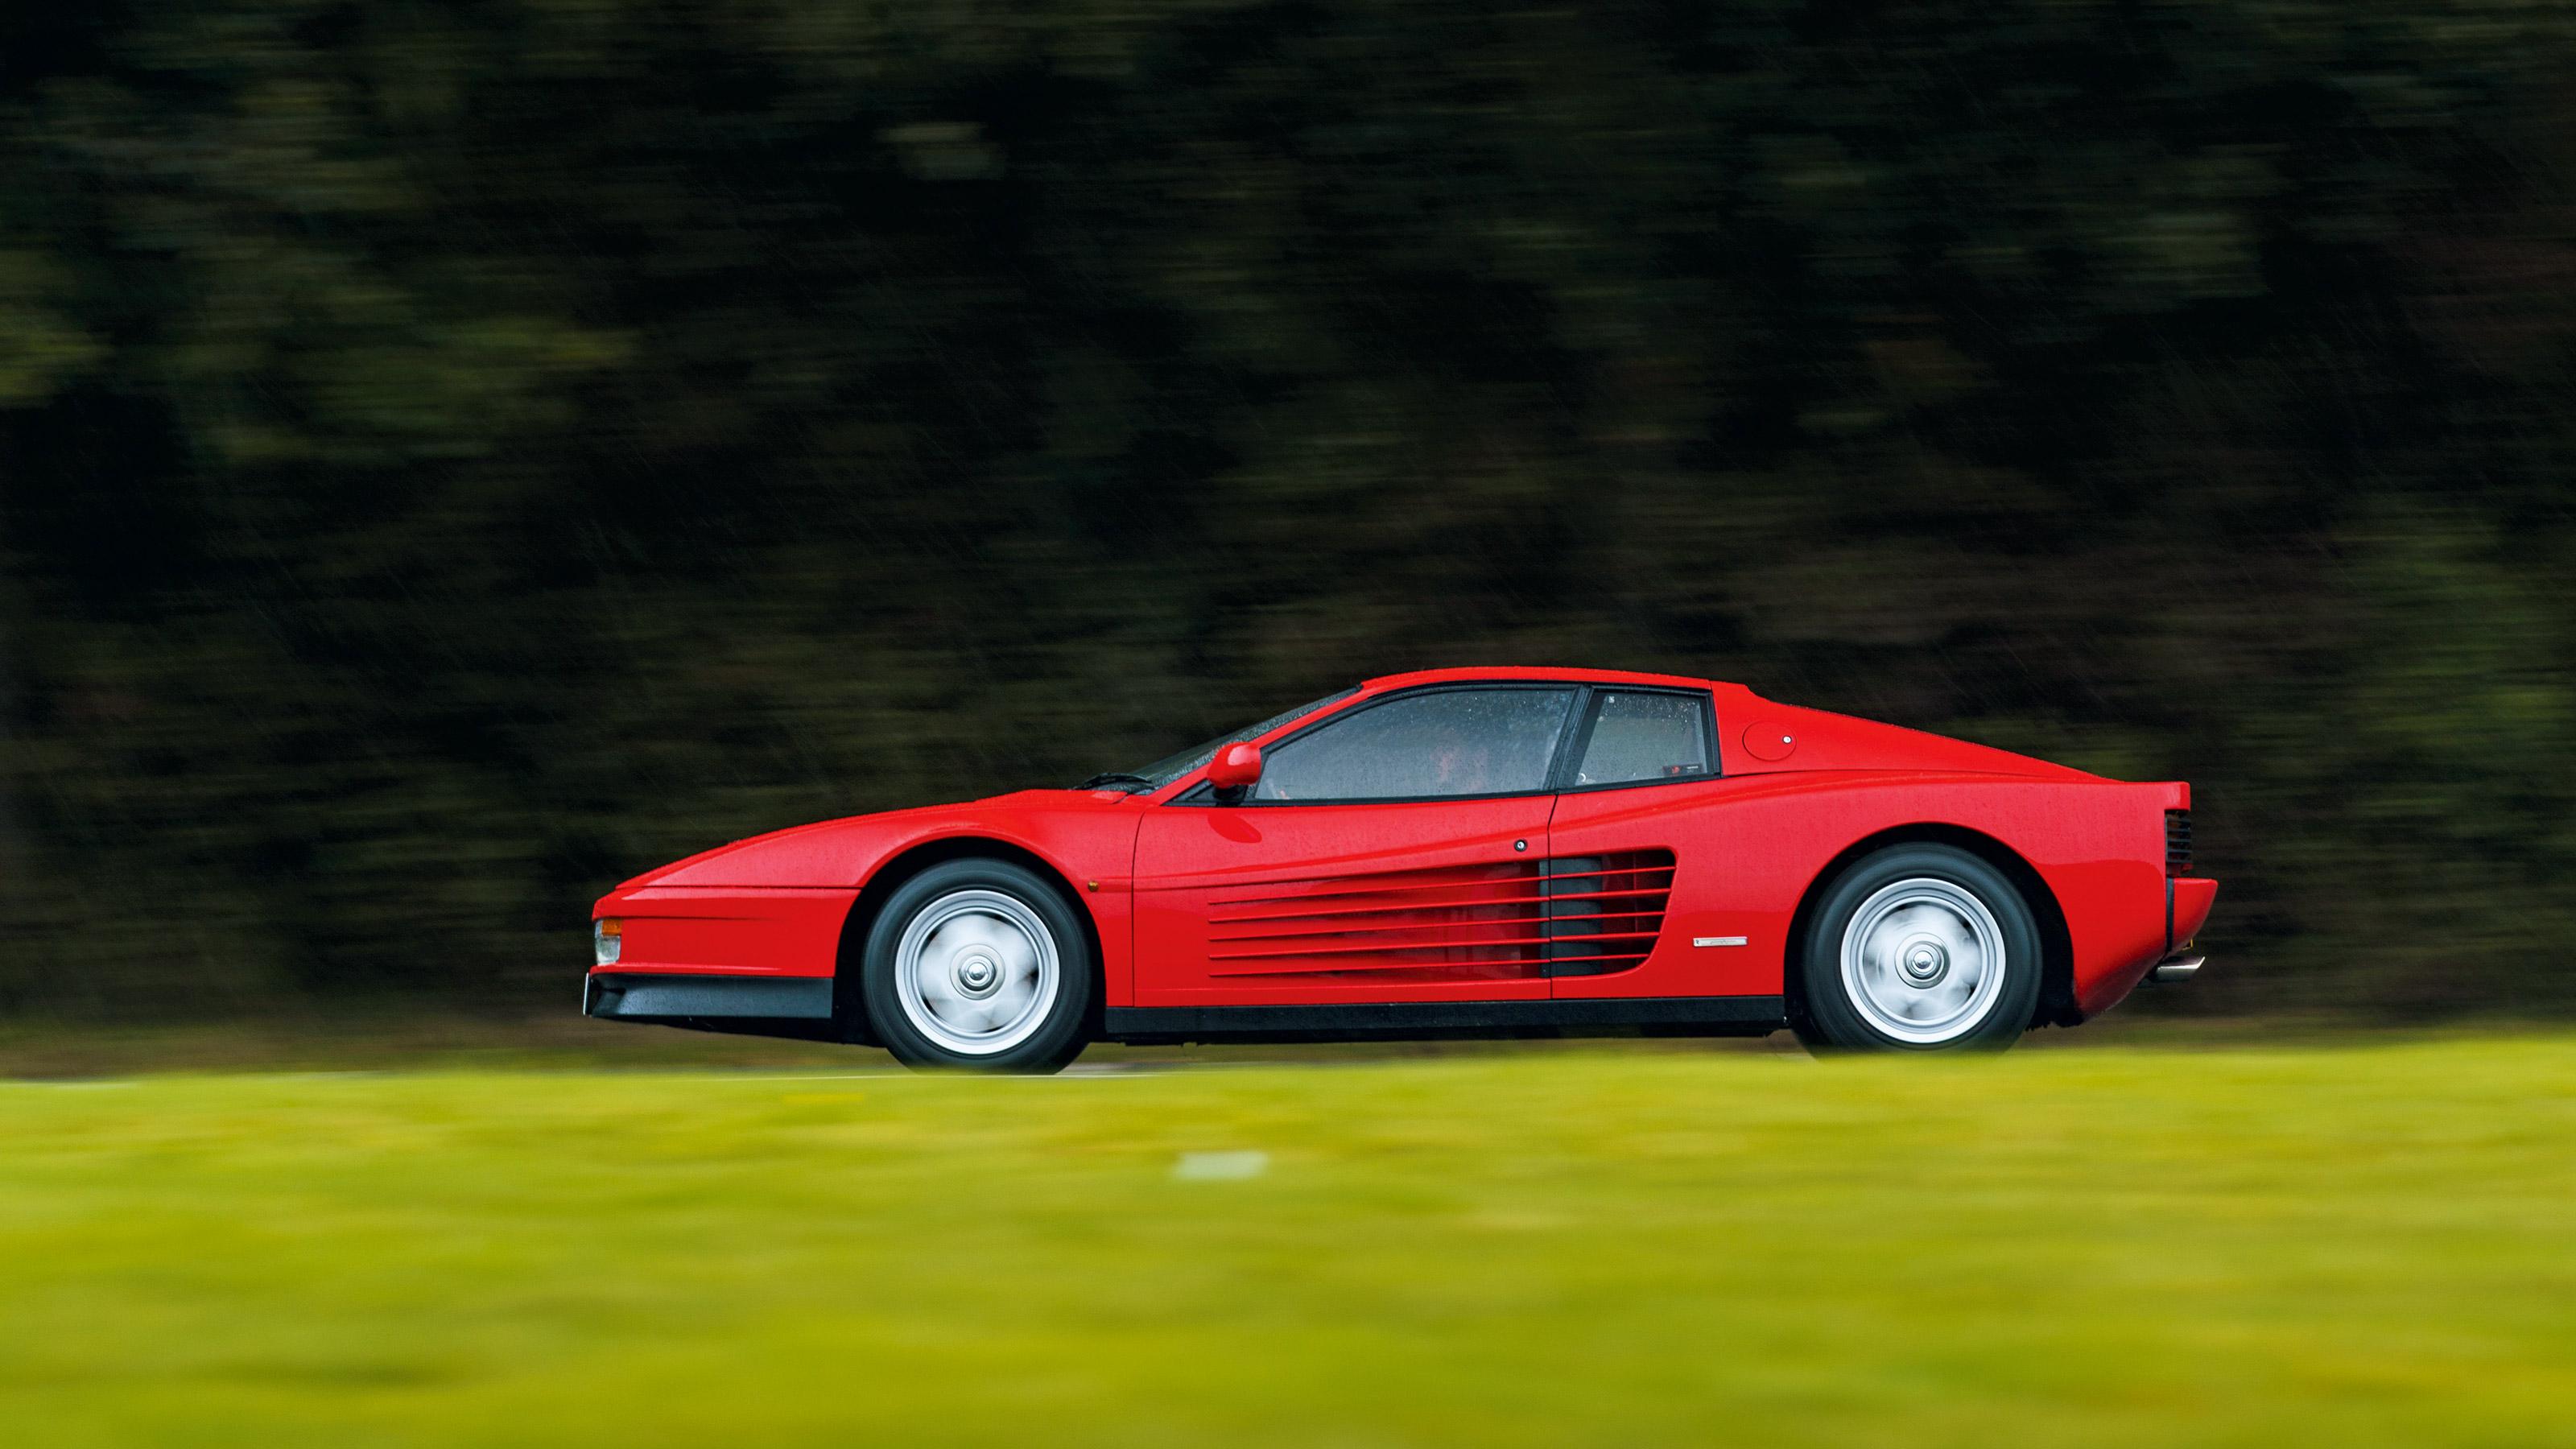 Ferrari Testarossa Review History And Specs Tr Generations Driven Back To Back Evo